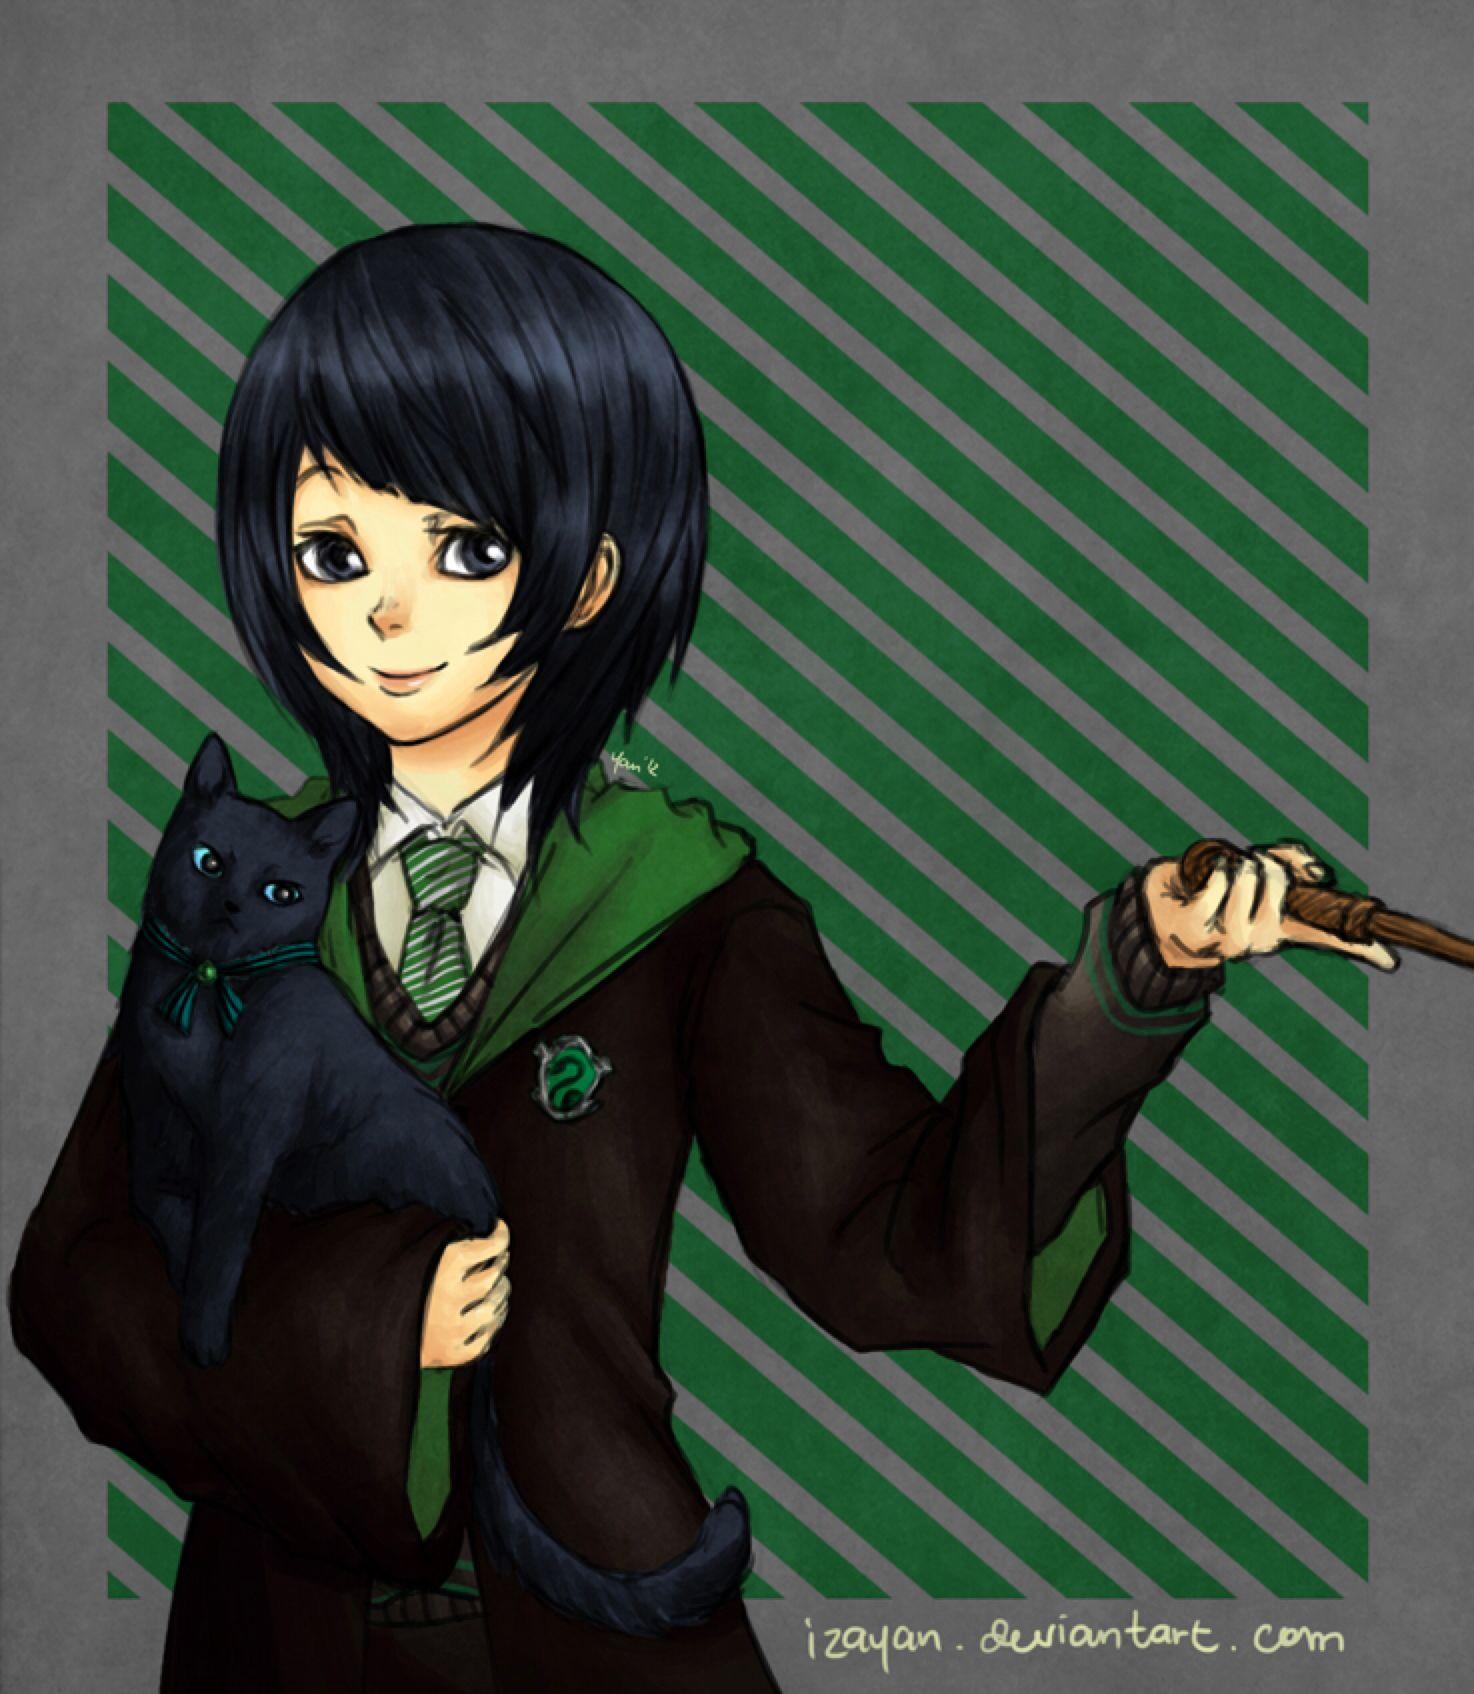 Pottermore Oc By Izayan On Deviantart Love Harry Potter Check Out Our Harry Potter Fanfiction Recommended Read Harry Potter Fan Art Pottermore Harry Potter